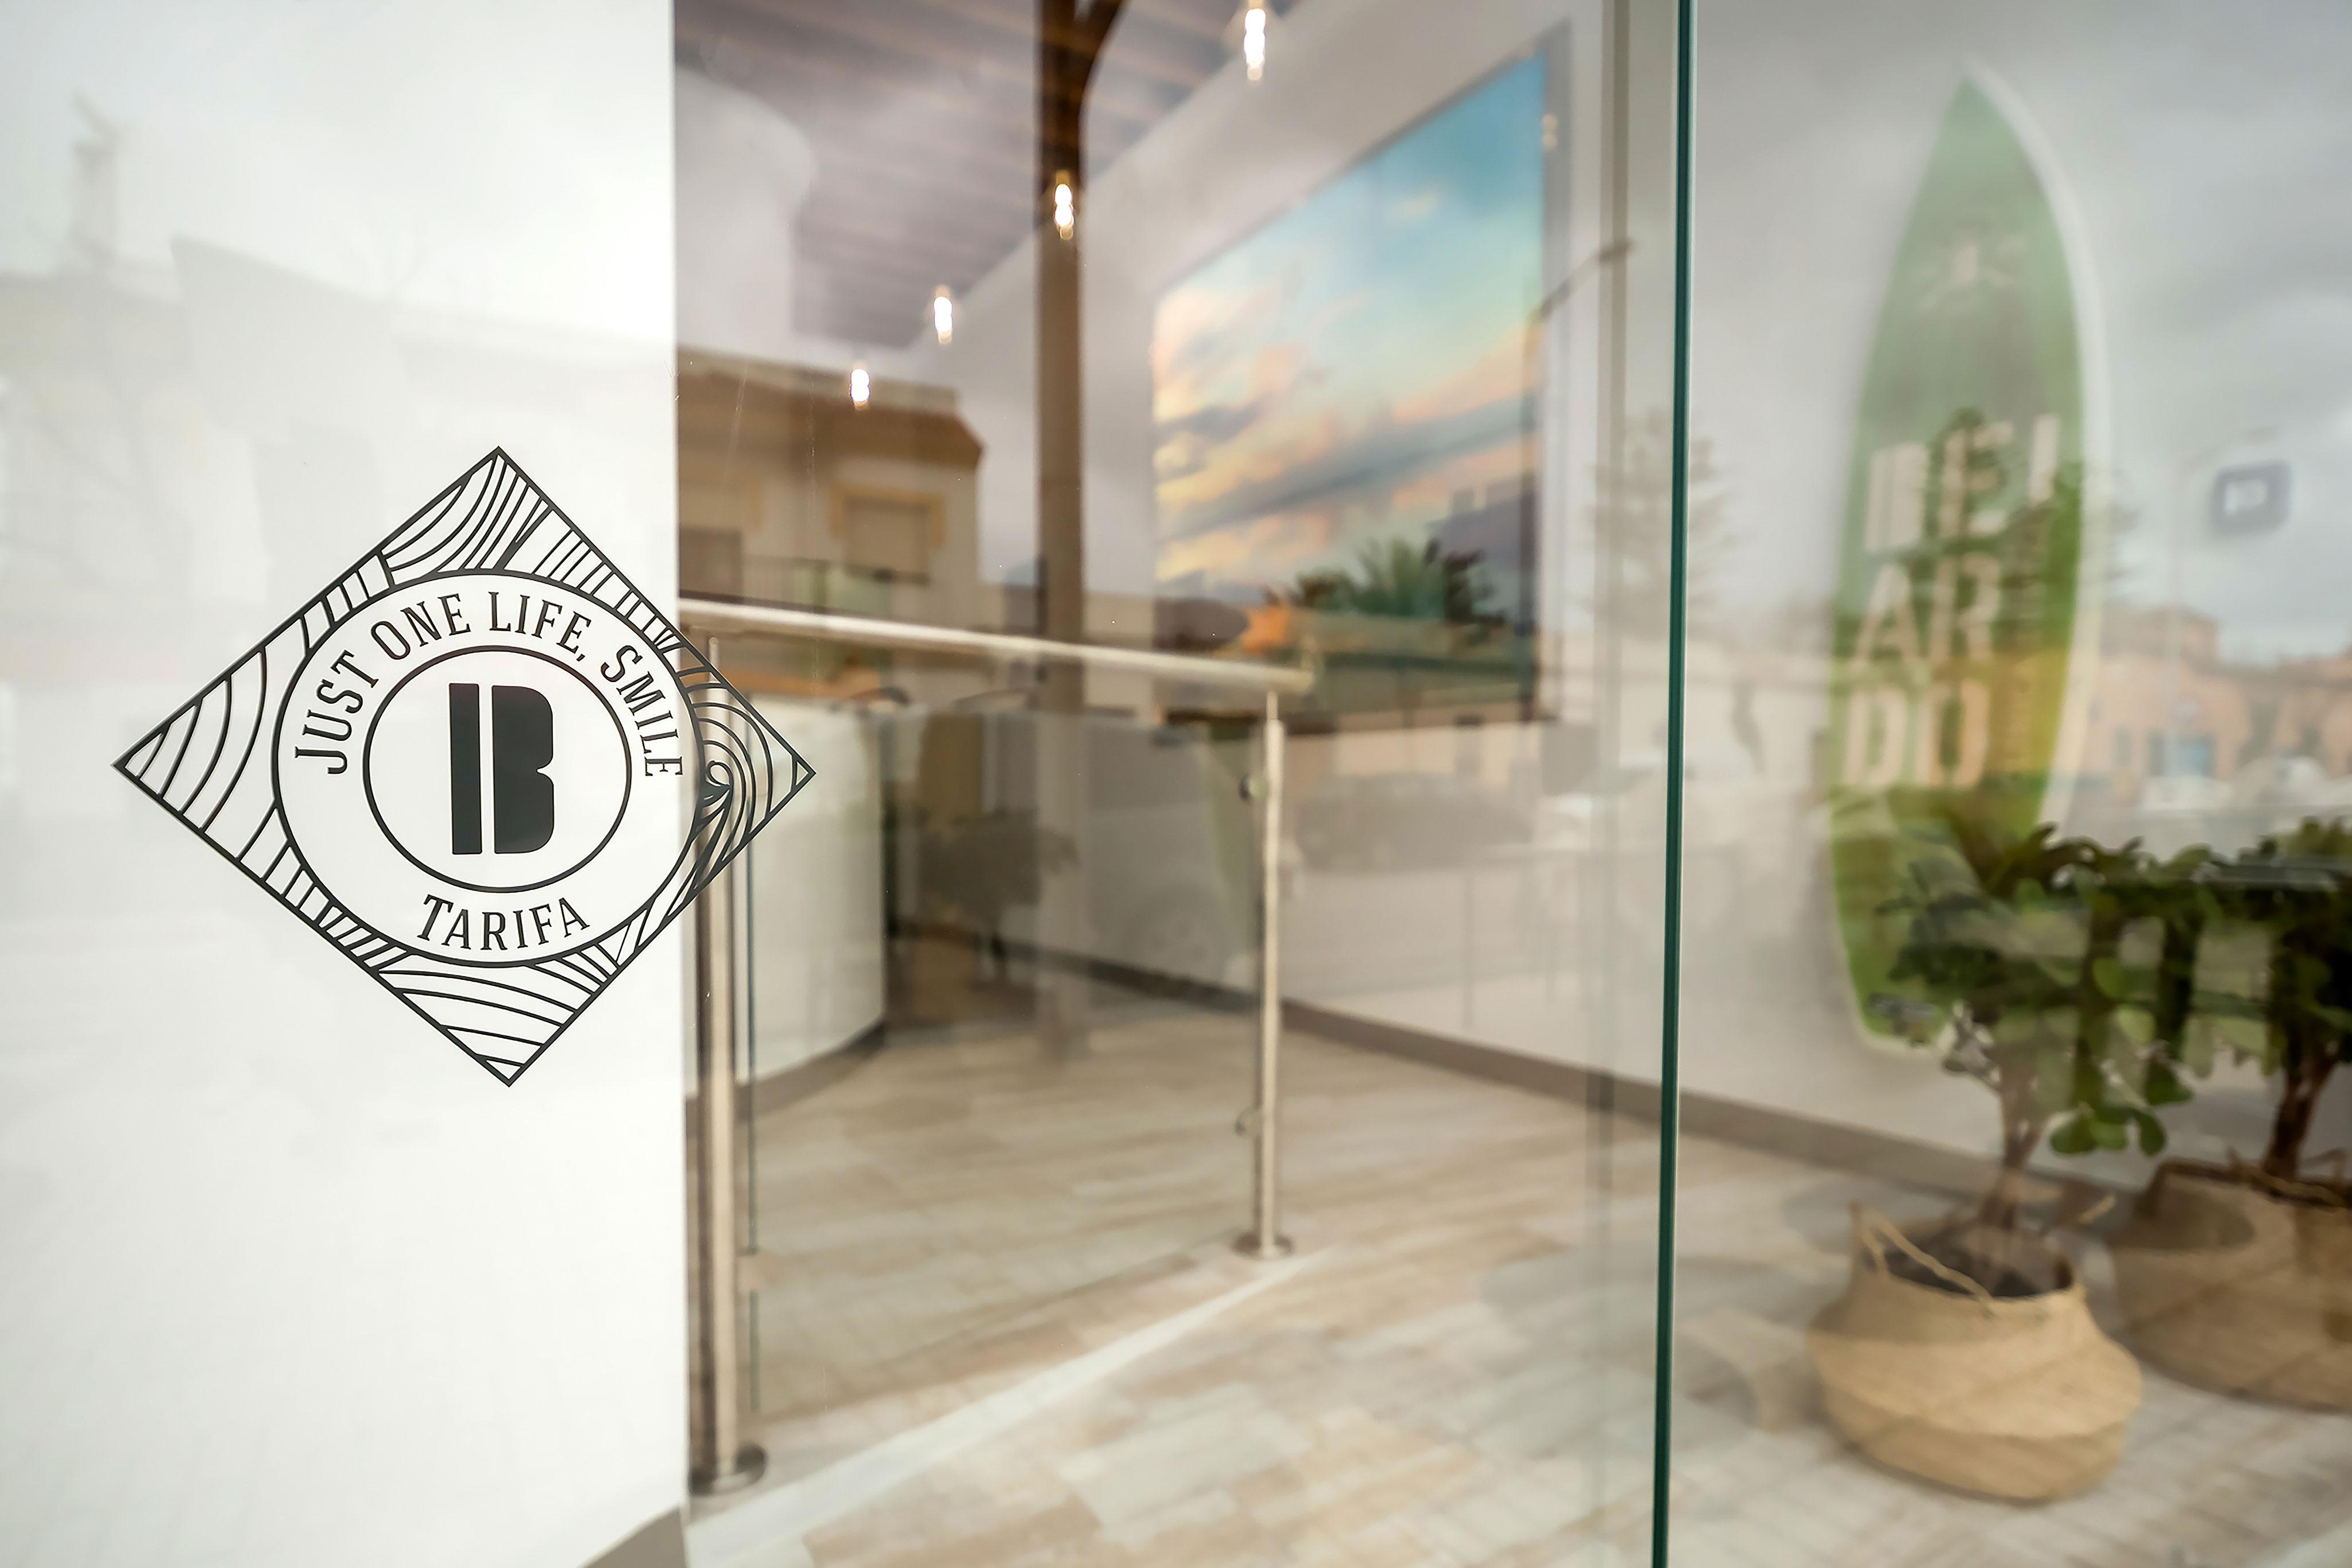 diseño-marca-tarifa-agencia-adhoc